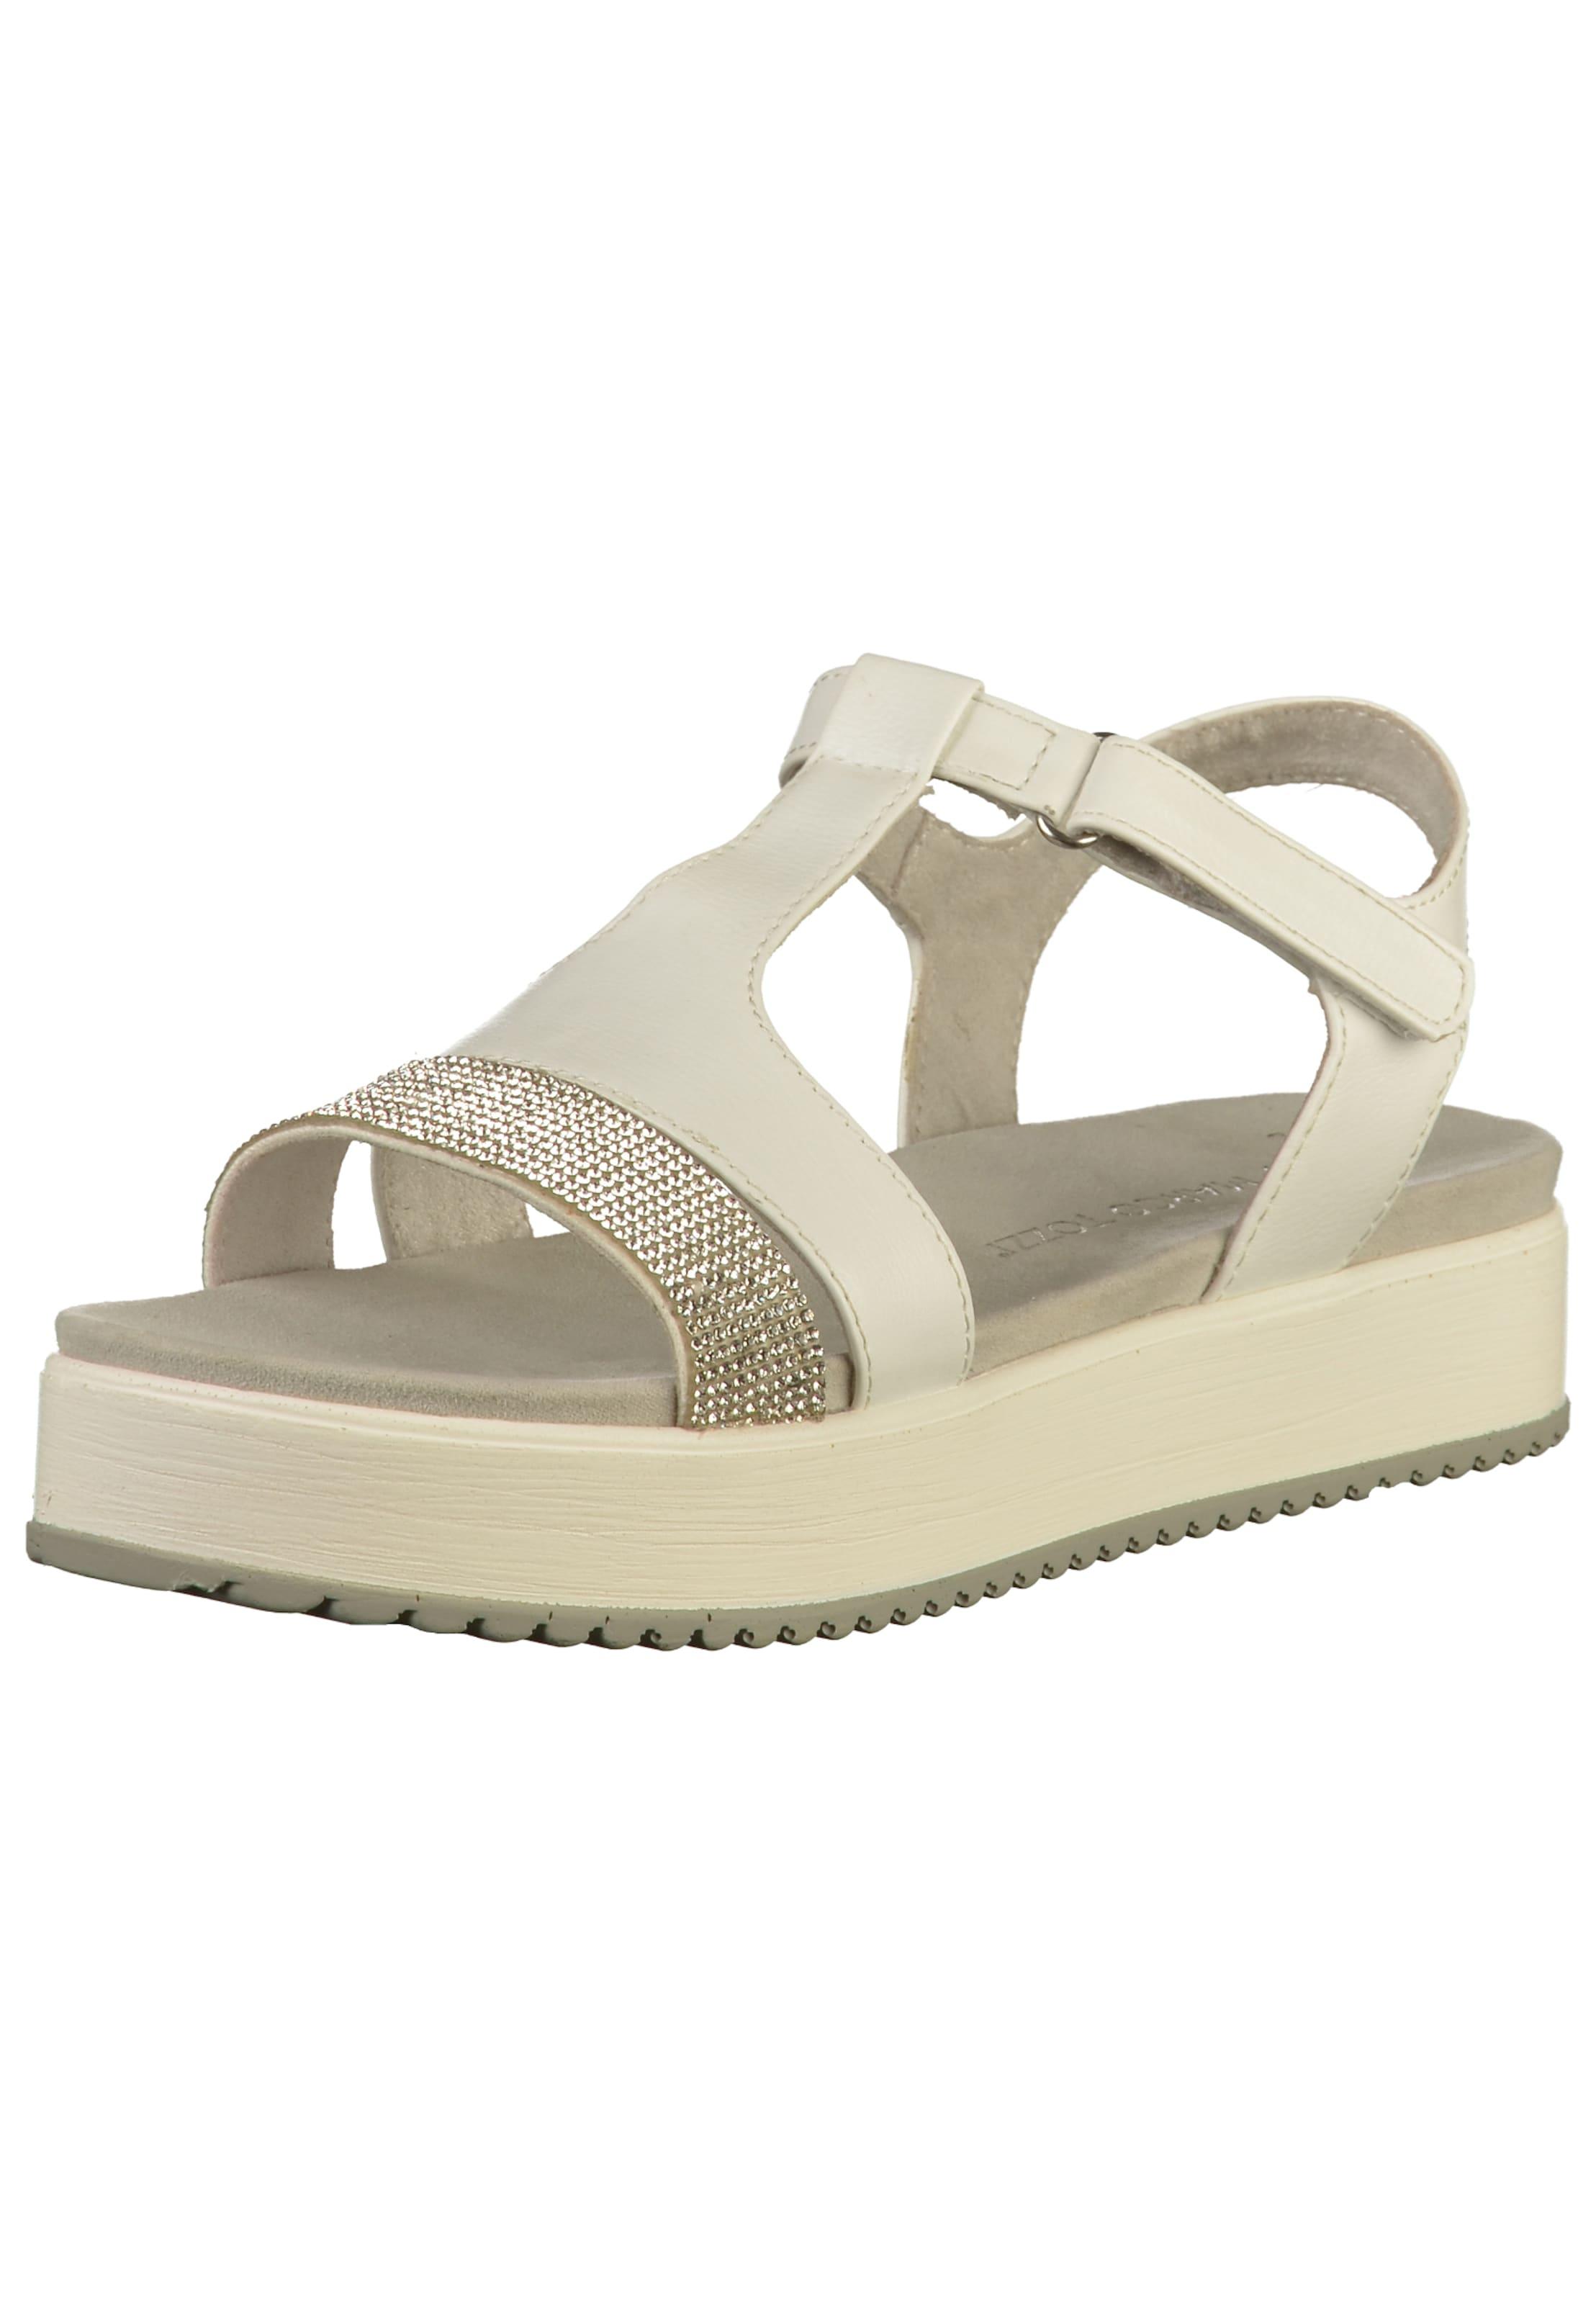 MARCO TOZZI Sandalen Günstige und langlebige Schuhe